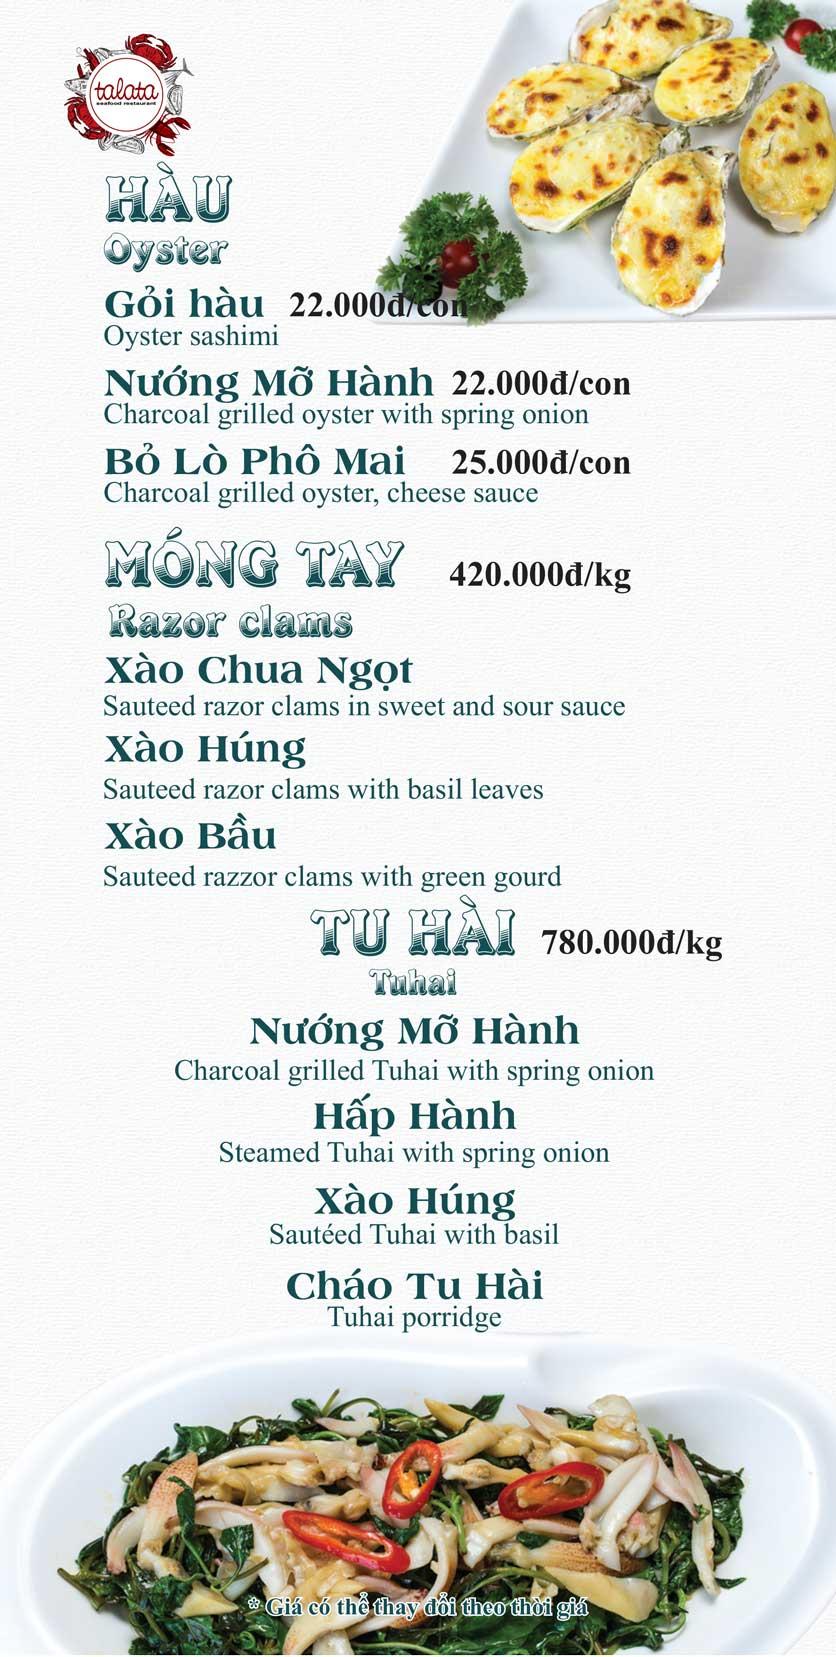 Menu Hải Sản Talata - Huỳnh Thúc Kháng 8